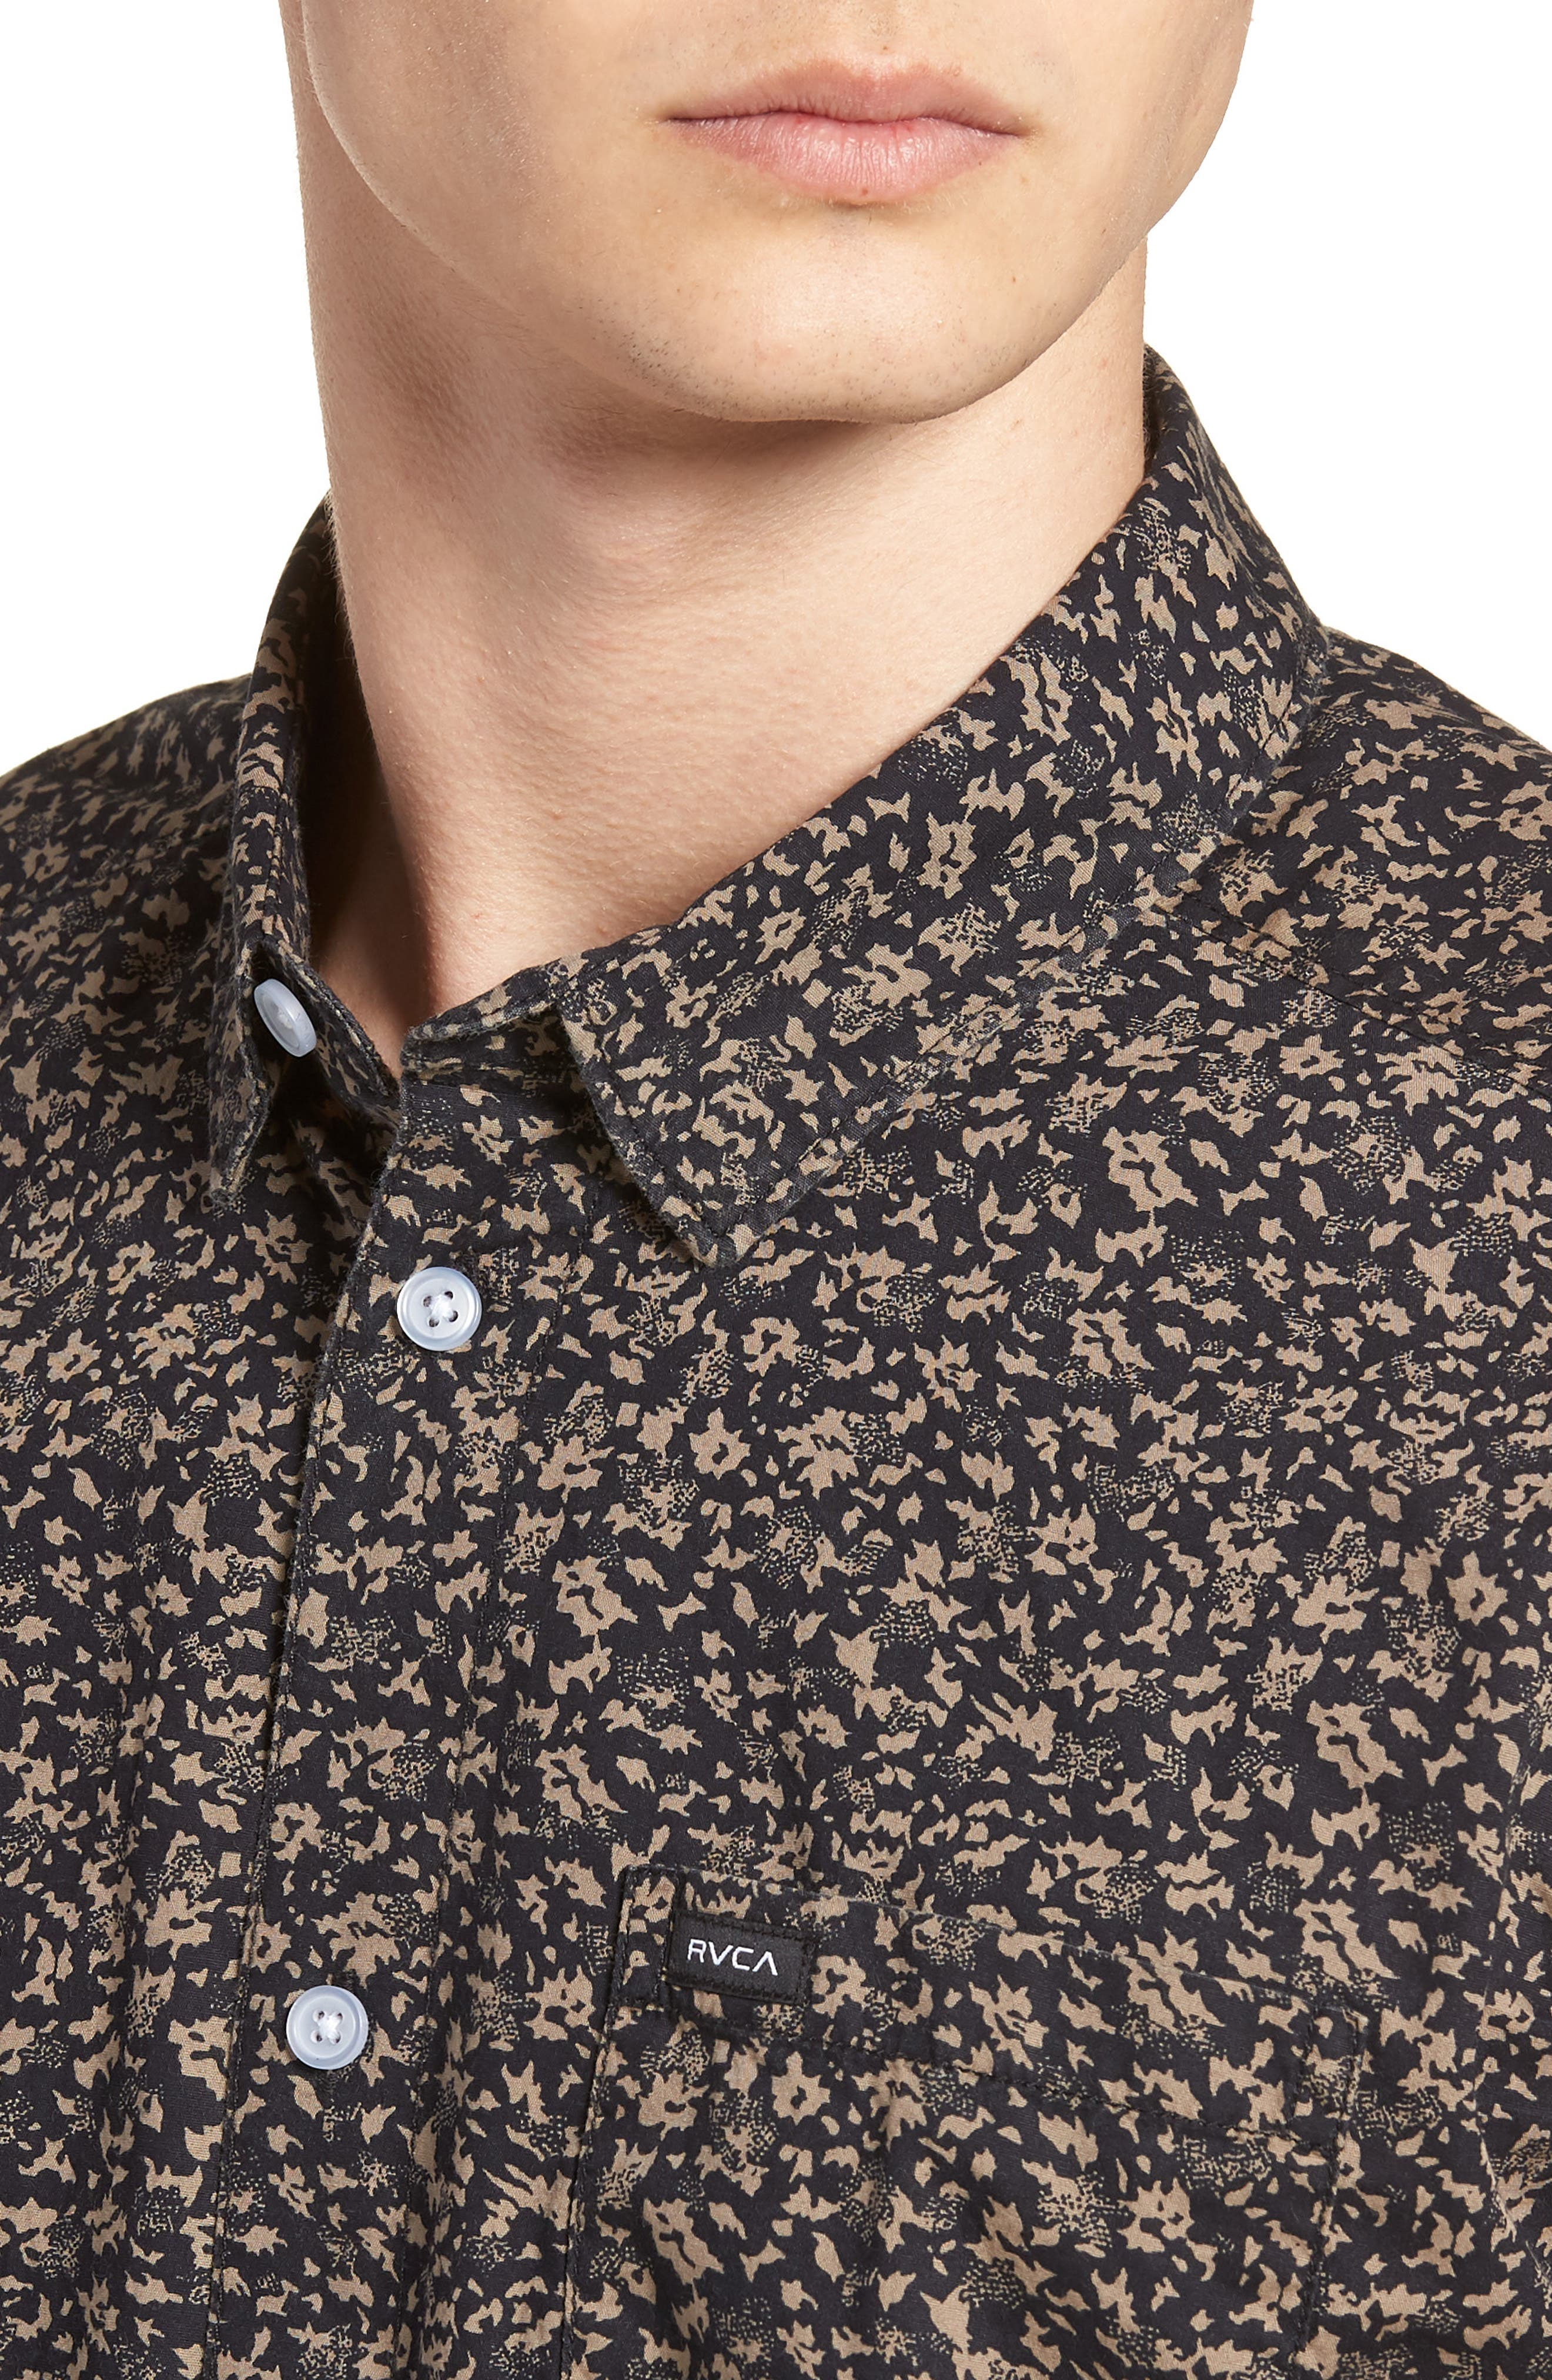 Dresden Woven Shirt,                             Alternate thumbnail 4, color,                             Pirate Black